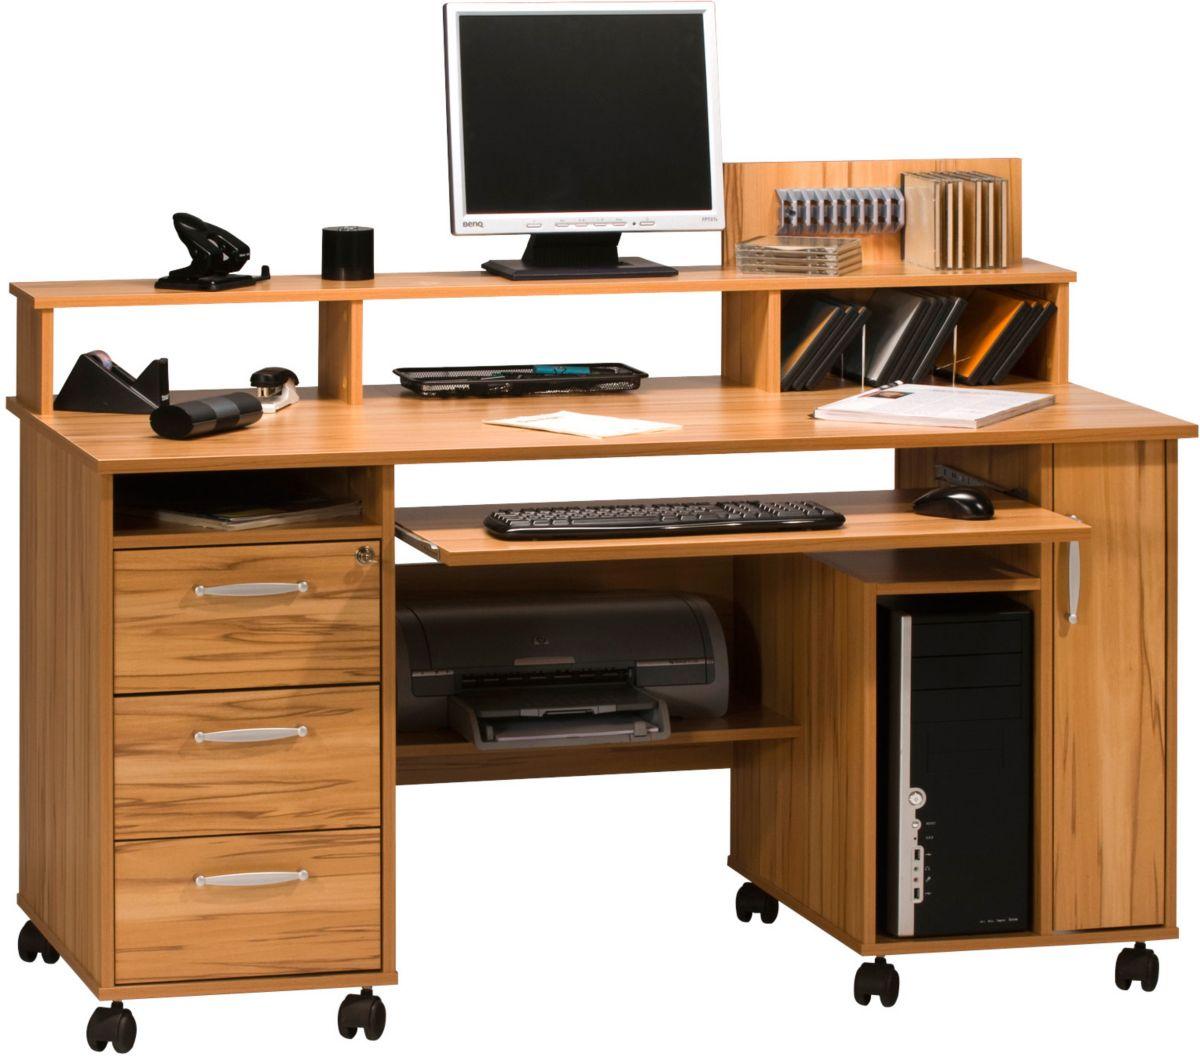 schreibtisch amp raquo jonas amp laquo. Black Bedroom Furniture Sets. Home Design Ideas